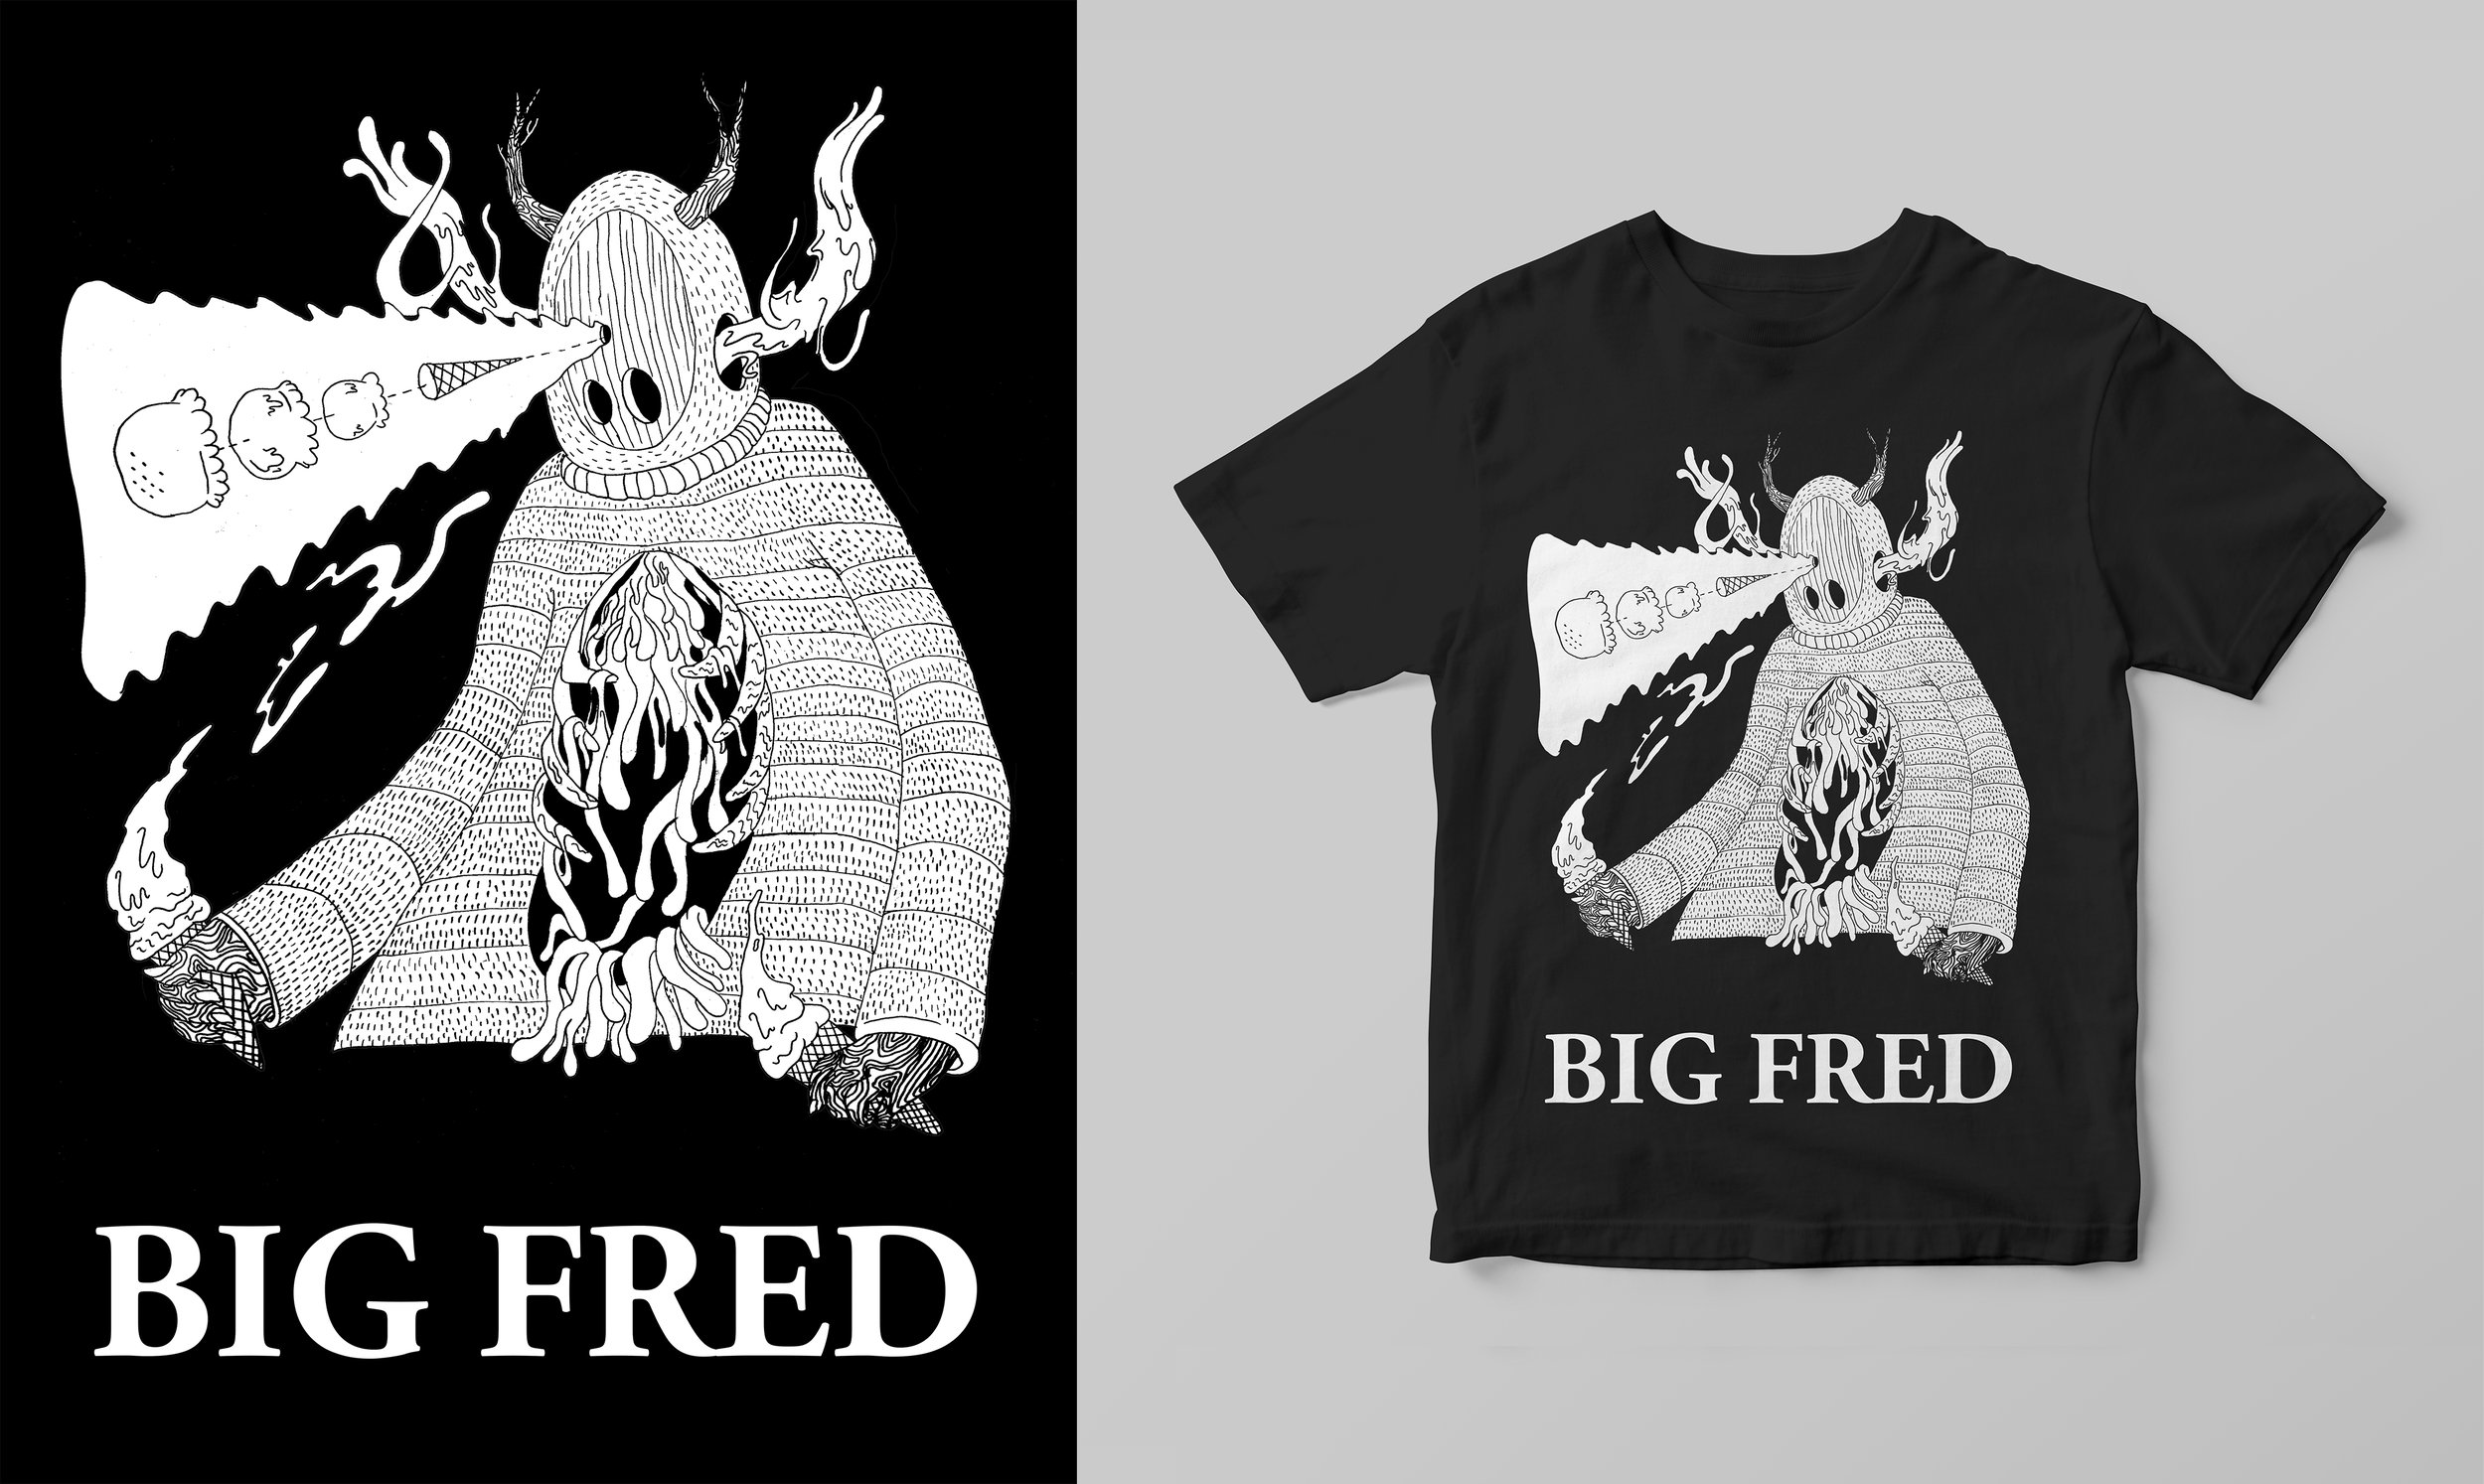 Big Fred T Shirt